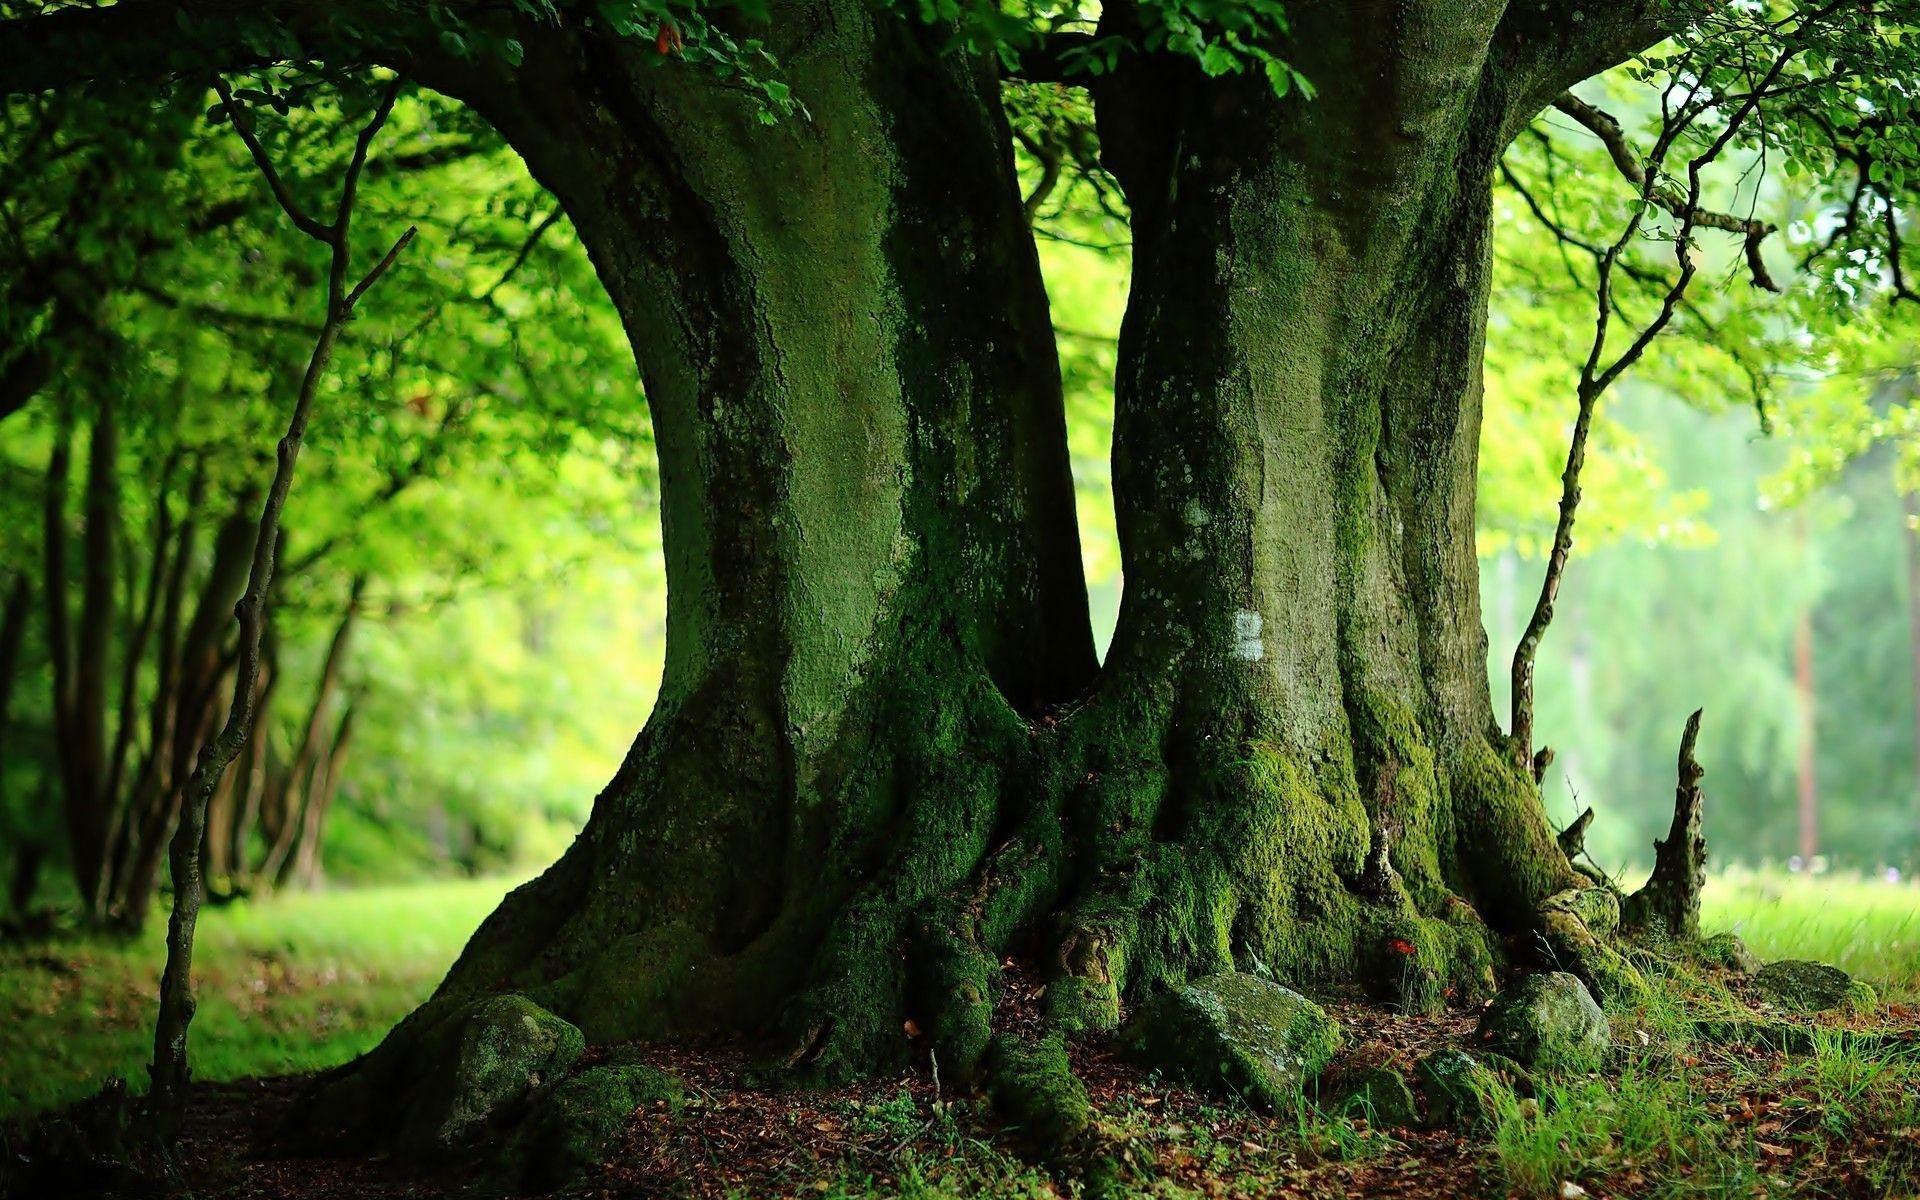 Green Landscape Tree Photography Tree Photography Wallpaper Nature Tree